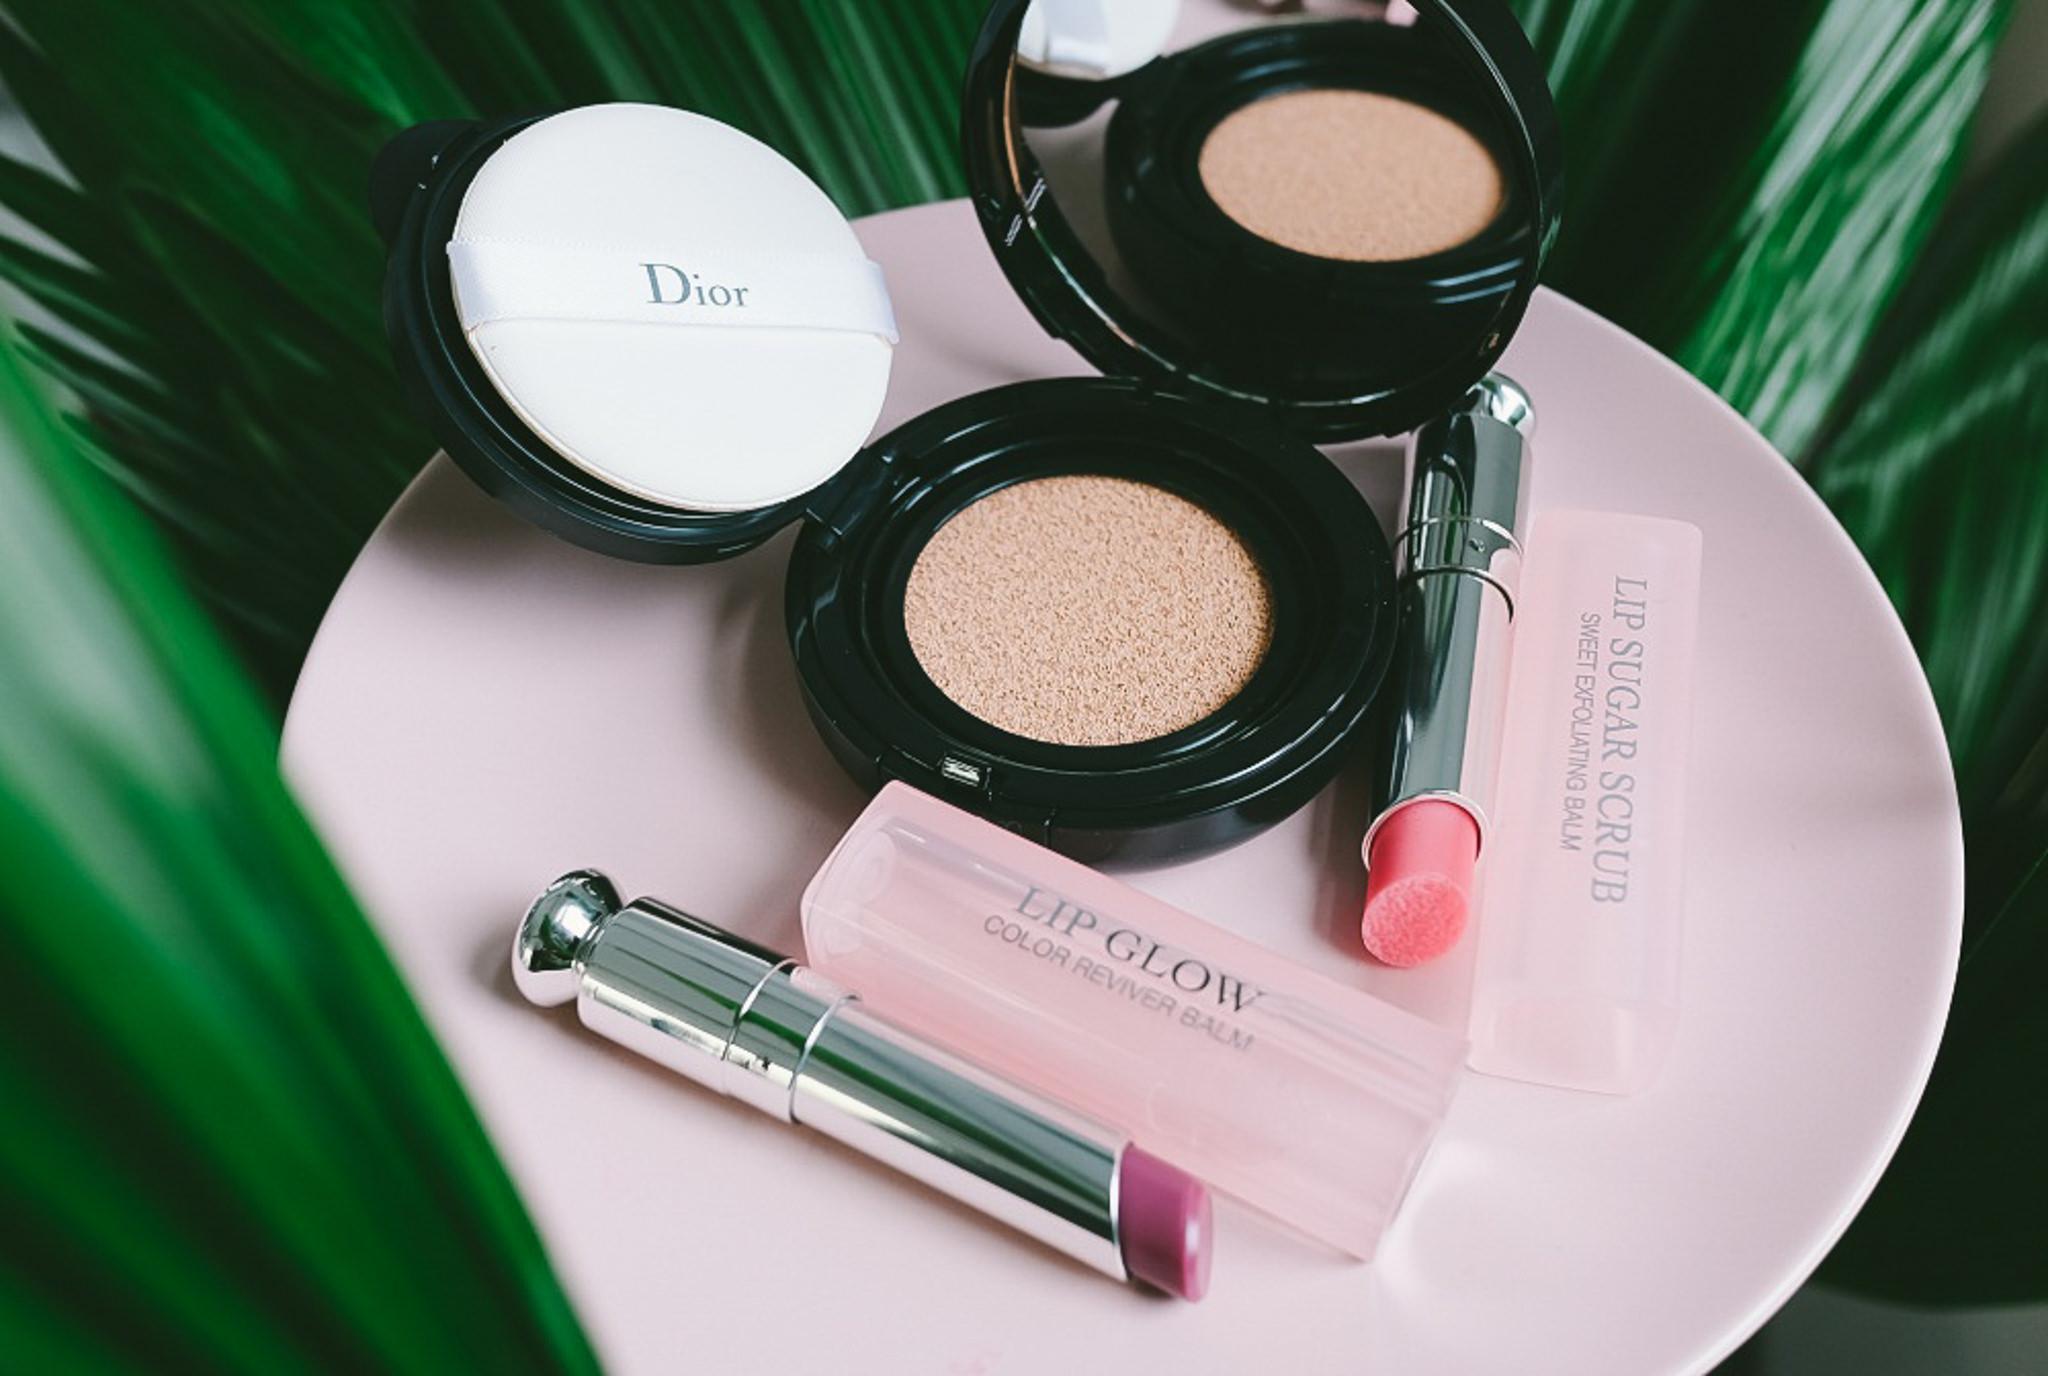 Dior 超完美持久氣墊粉餅 – 持續16小時的完美霧光